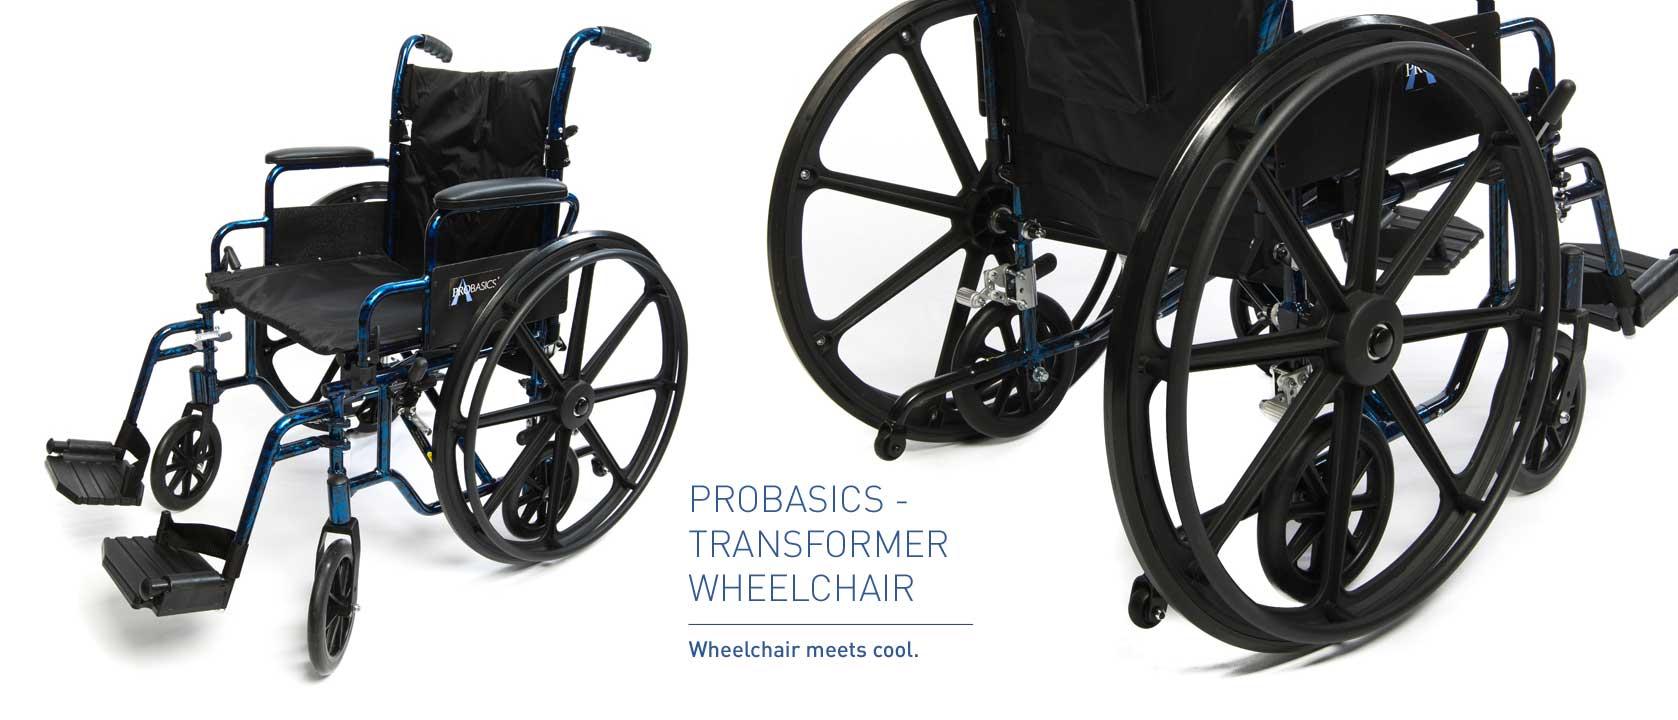 Sale, Rental and Repair of Manual | Powered Wheelchairs